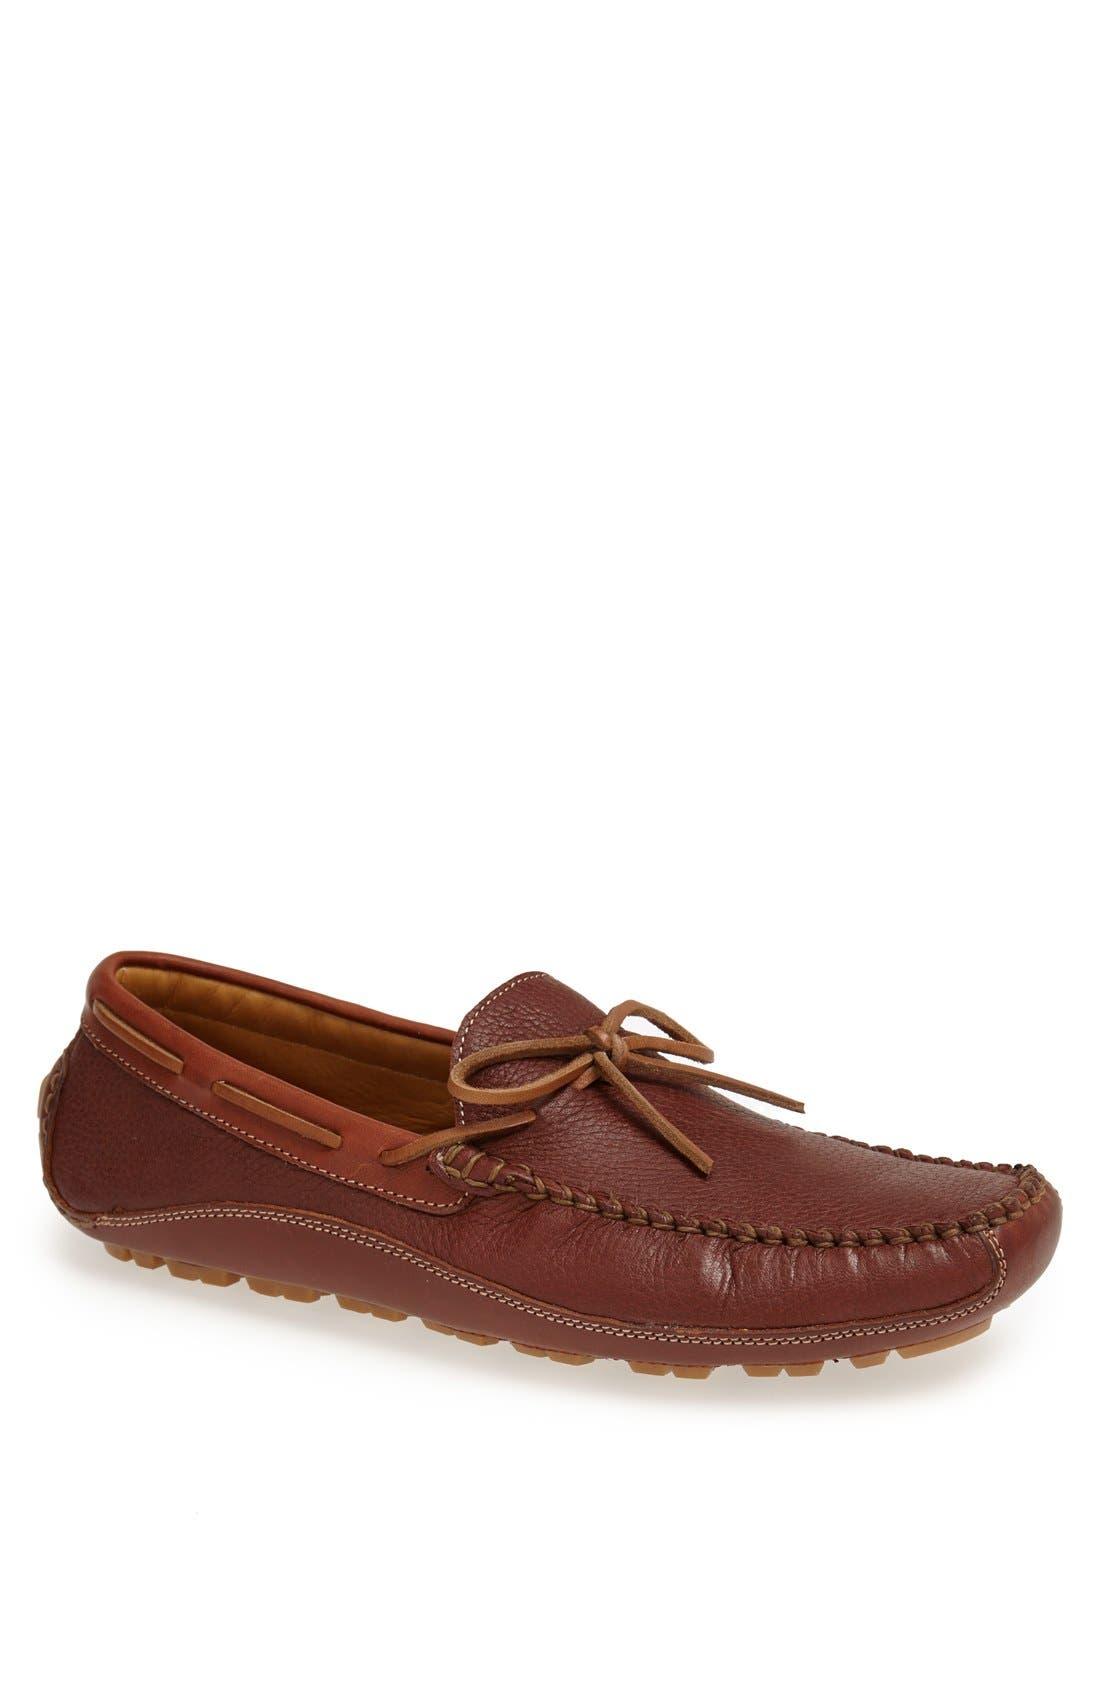 'Drake' Leather Driving Shoe,                             Main thumbnail 5, color,